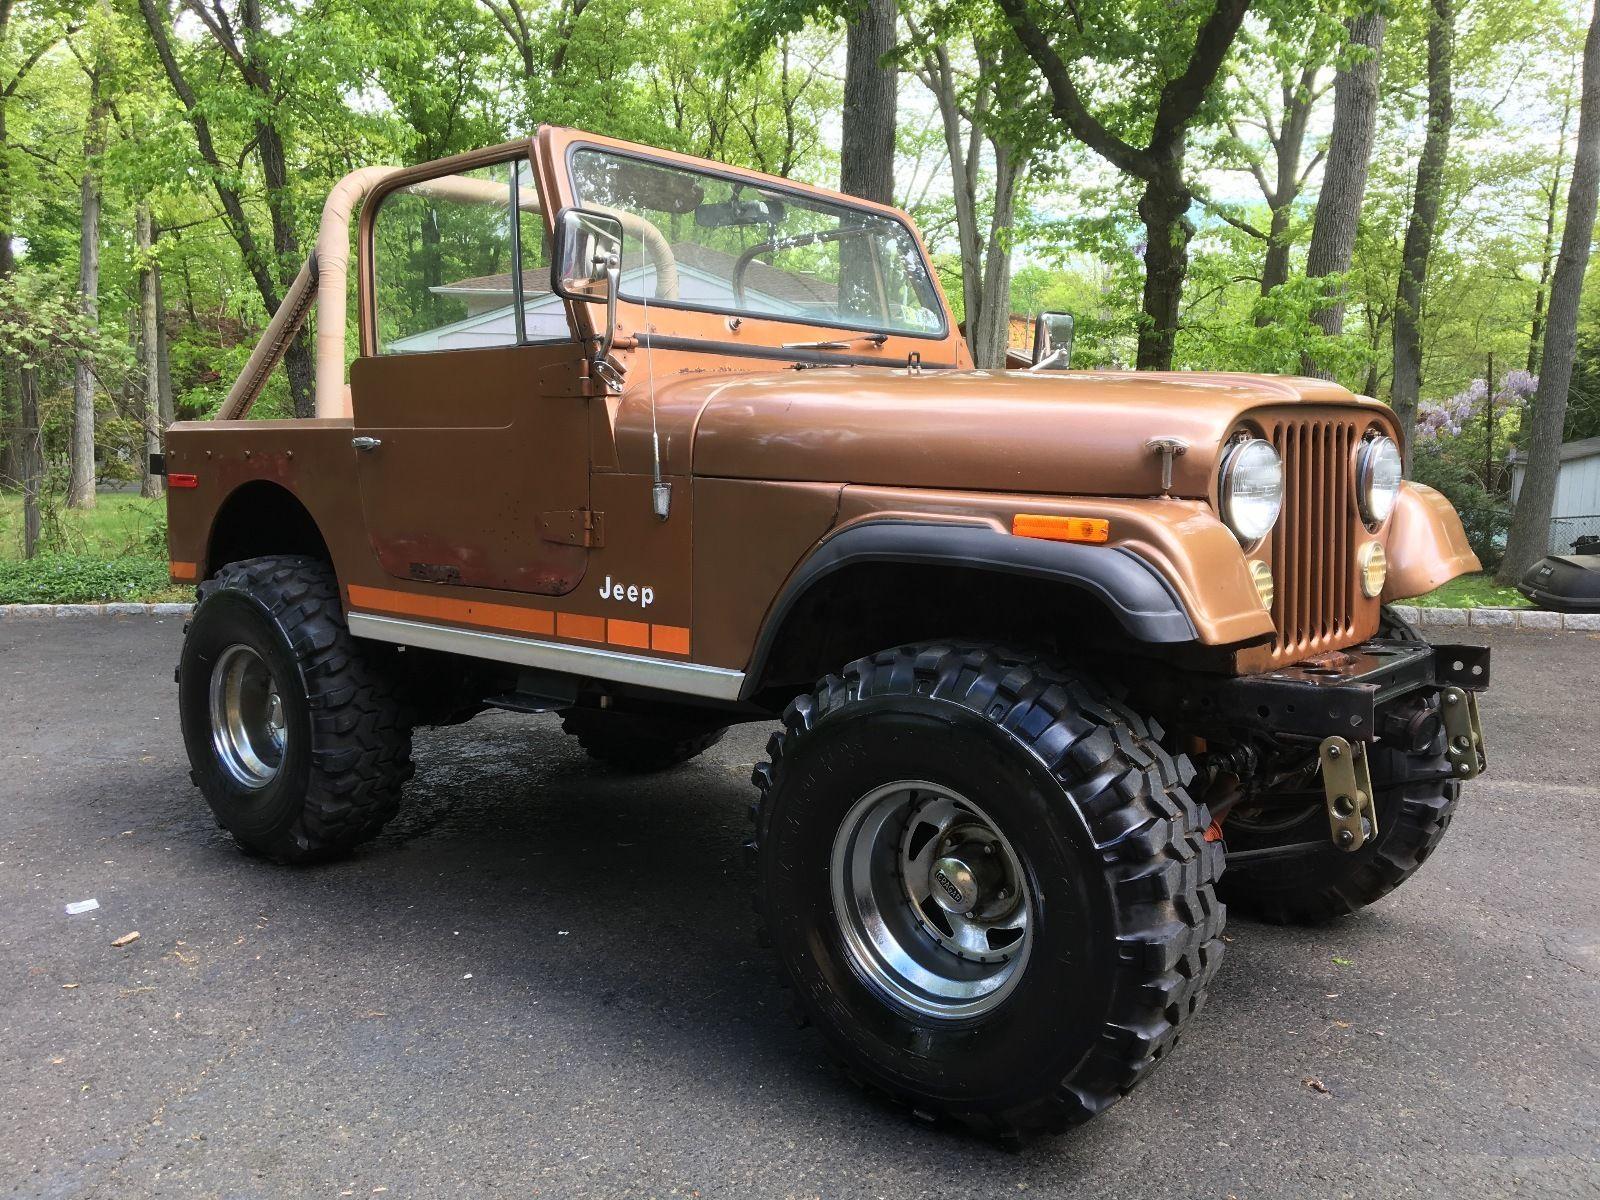 Jeep Wrangler Hemi >> Gold beauty 1979 Jeep CJ monster for sale